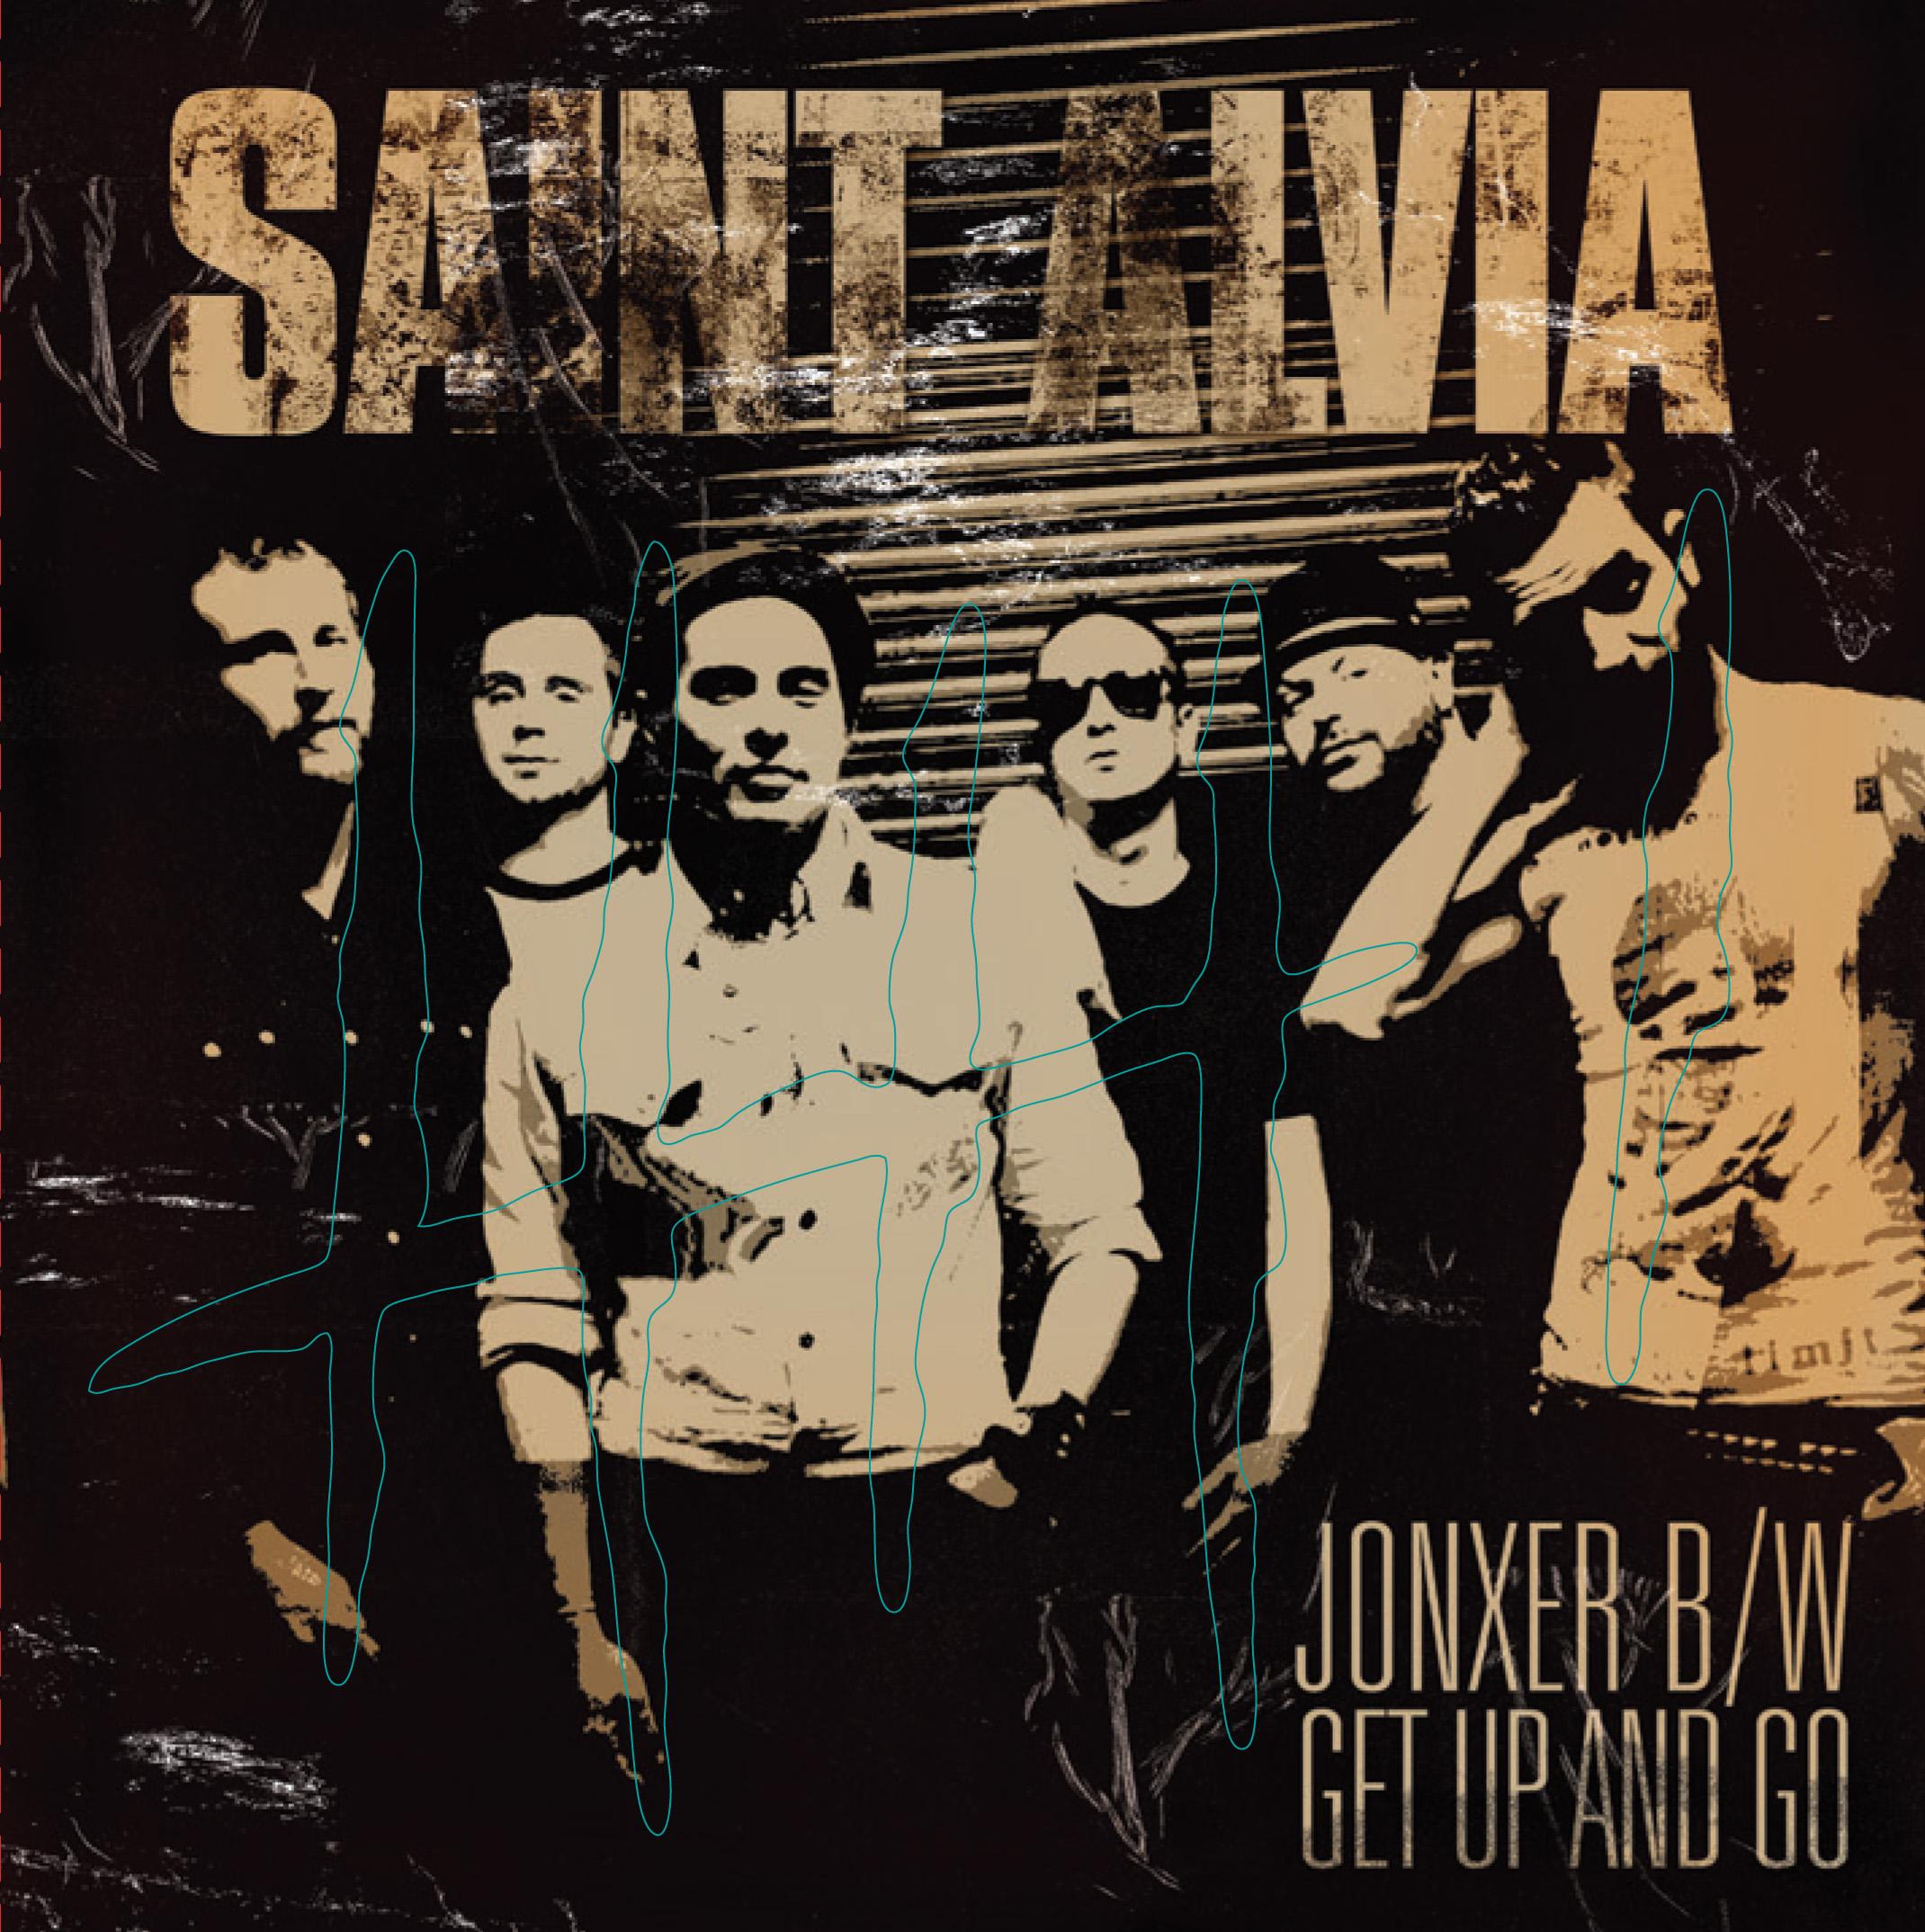 Saint Alvia - Jonxer b/w & Get Up and Go 7